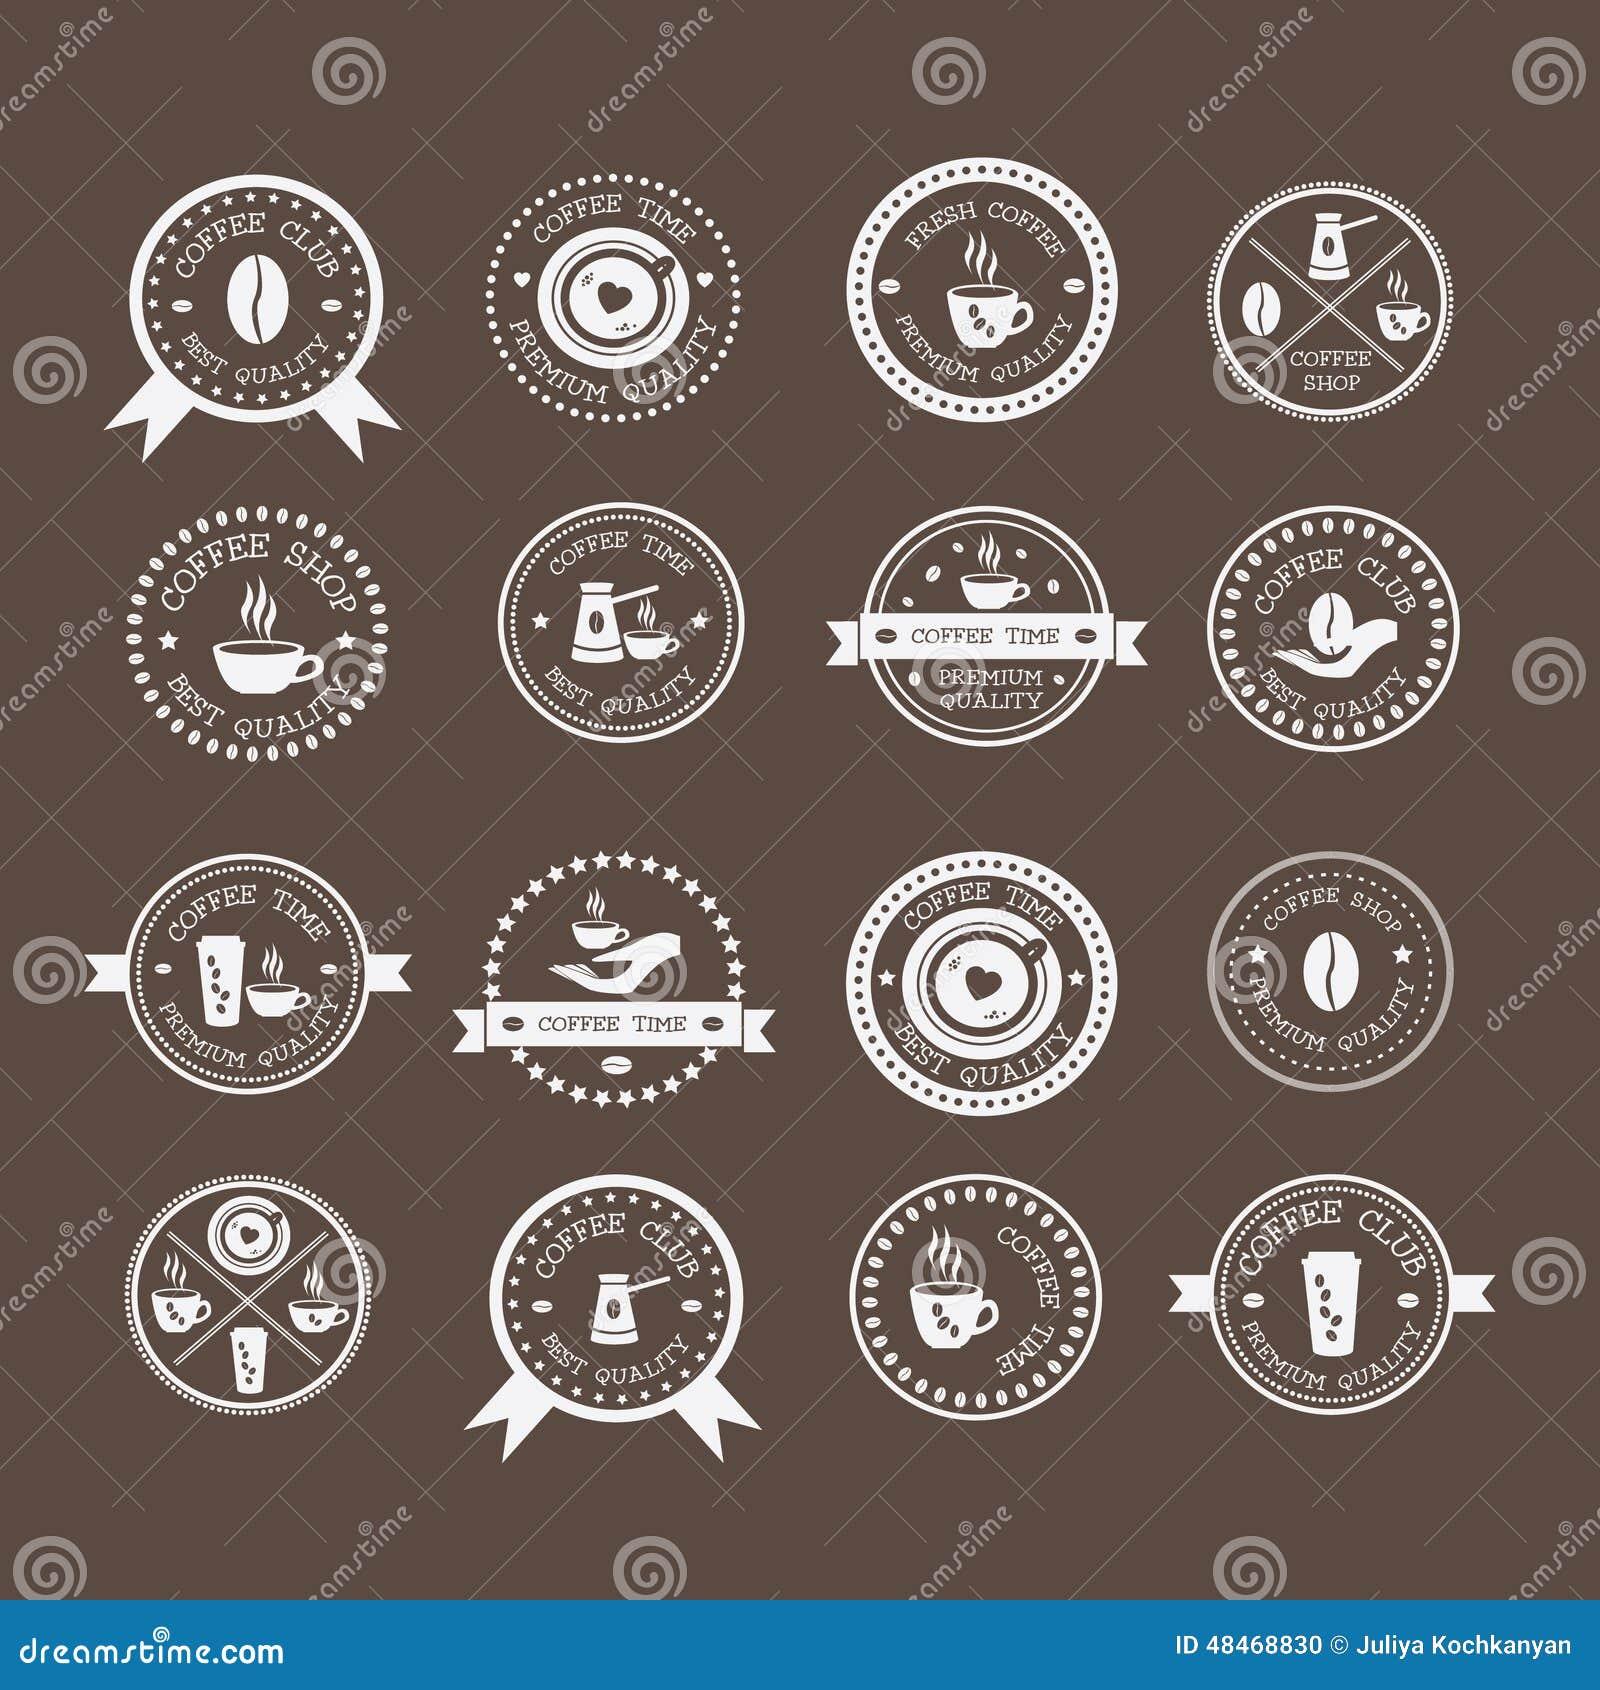 Art logo logo s coffee logo coffee shop coffee design shop logo coffee - Cafe Coffee Design Menu Restaurant Retro Set Shop